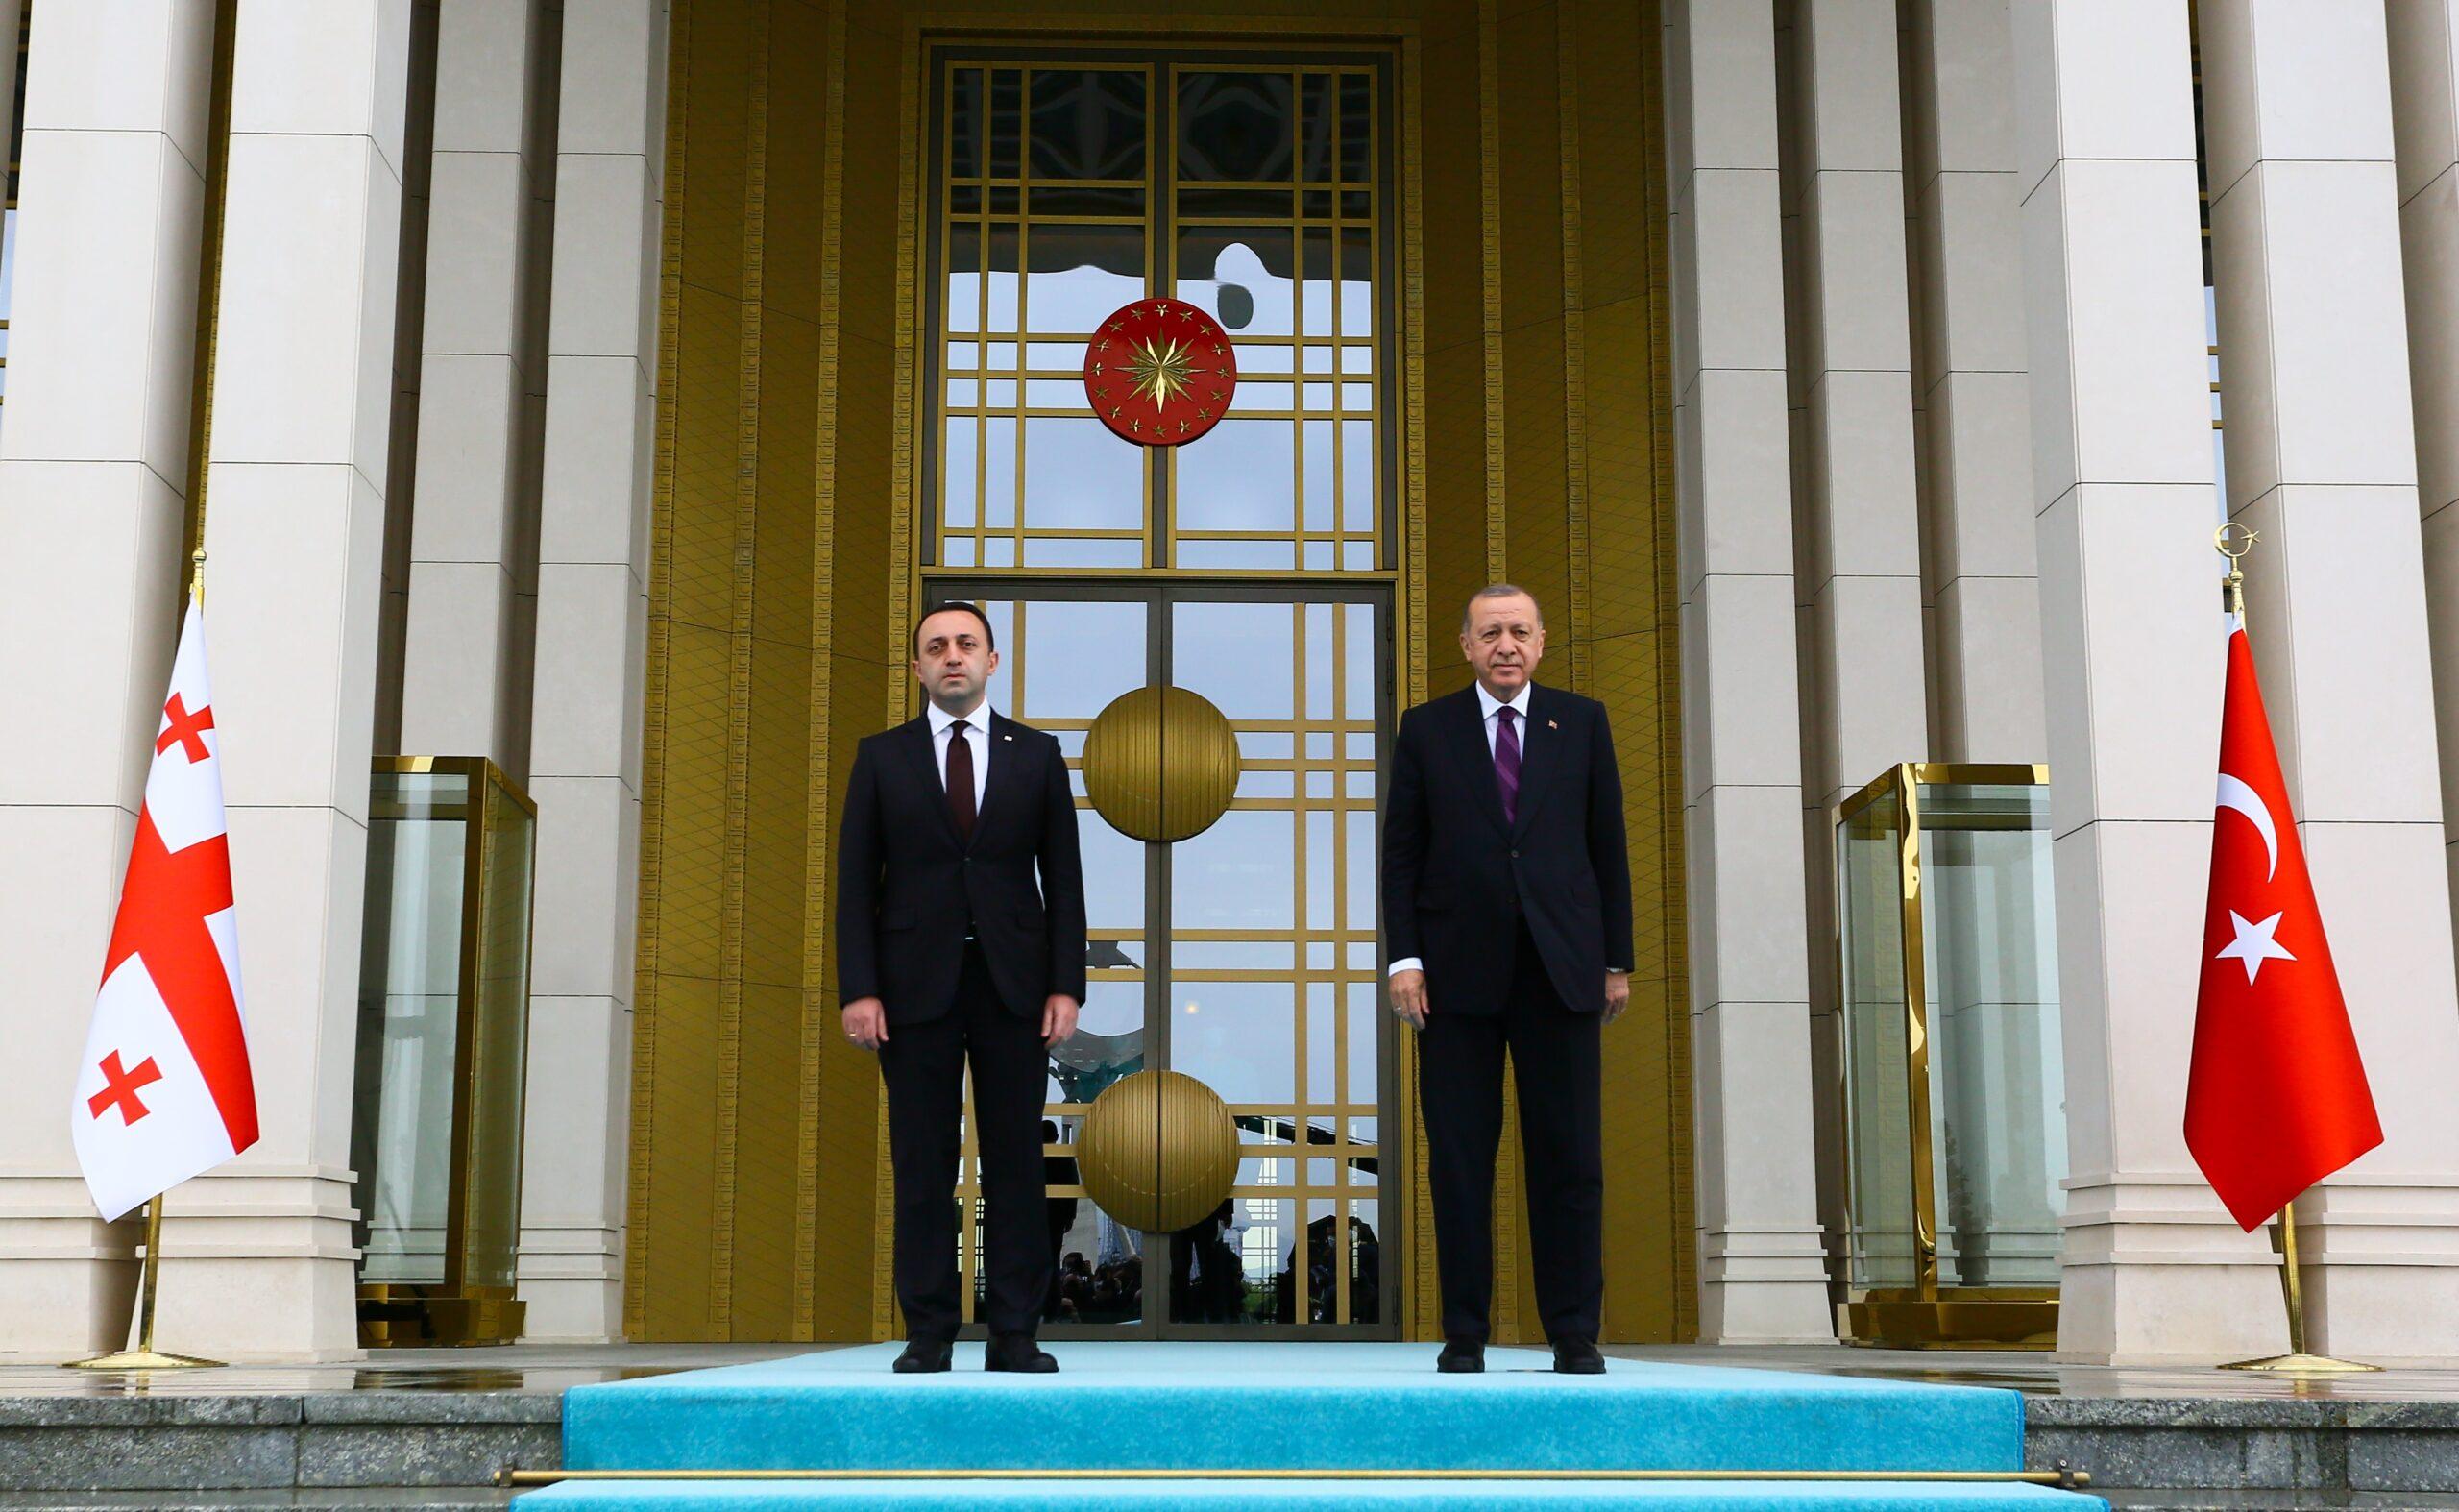 cumhurbaskani-erdogan-gurcistan-basbakani-garibashvili-yi-resmi-torenle-karsiladi-60b67a4d83abd